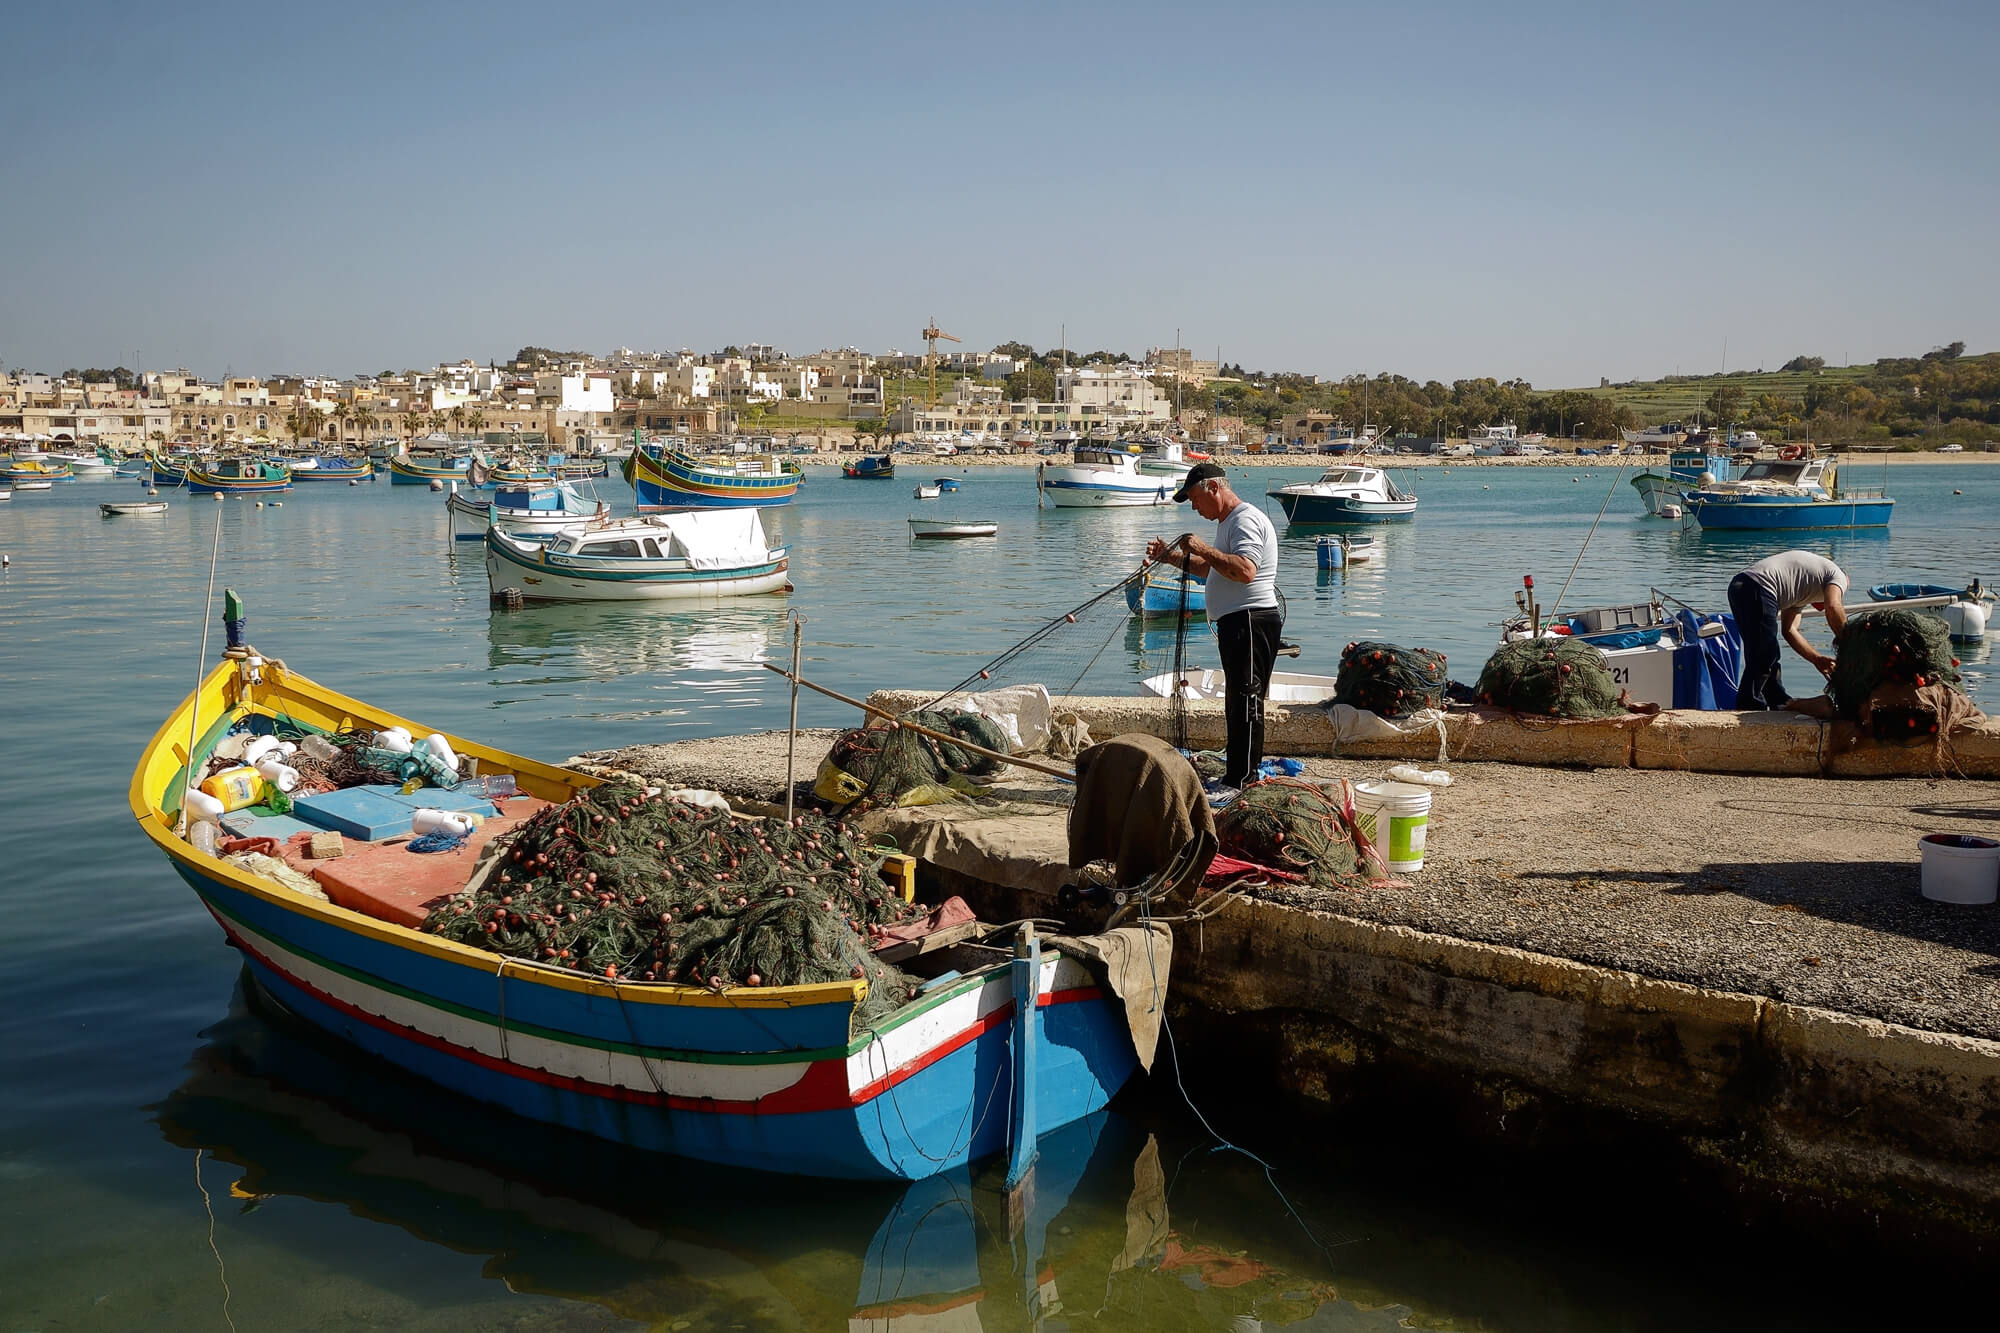 Fishermen in Marsaxlokk Malta